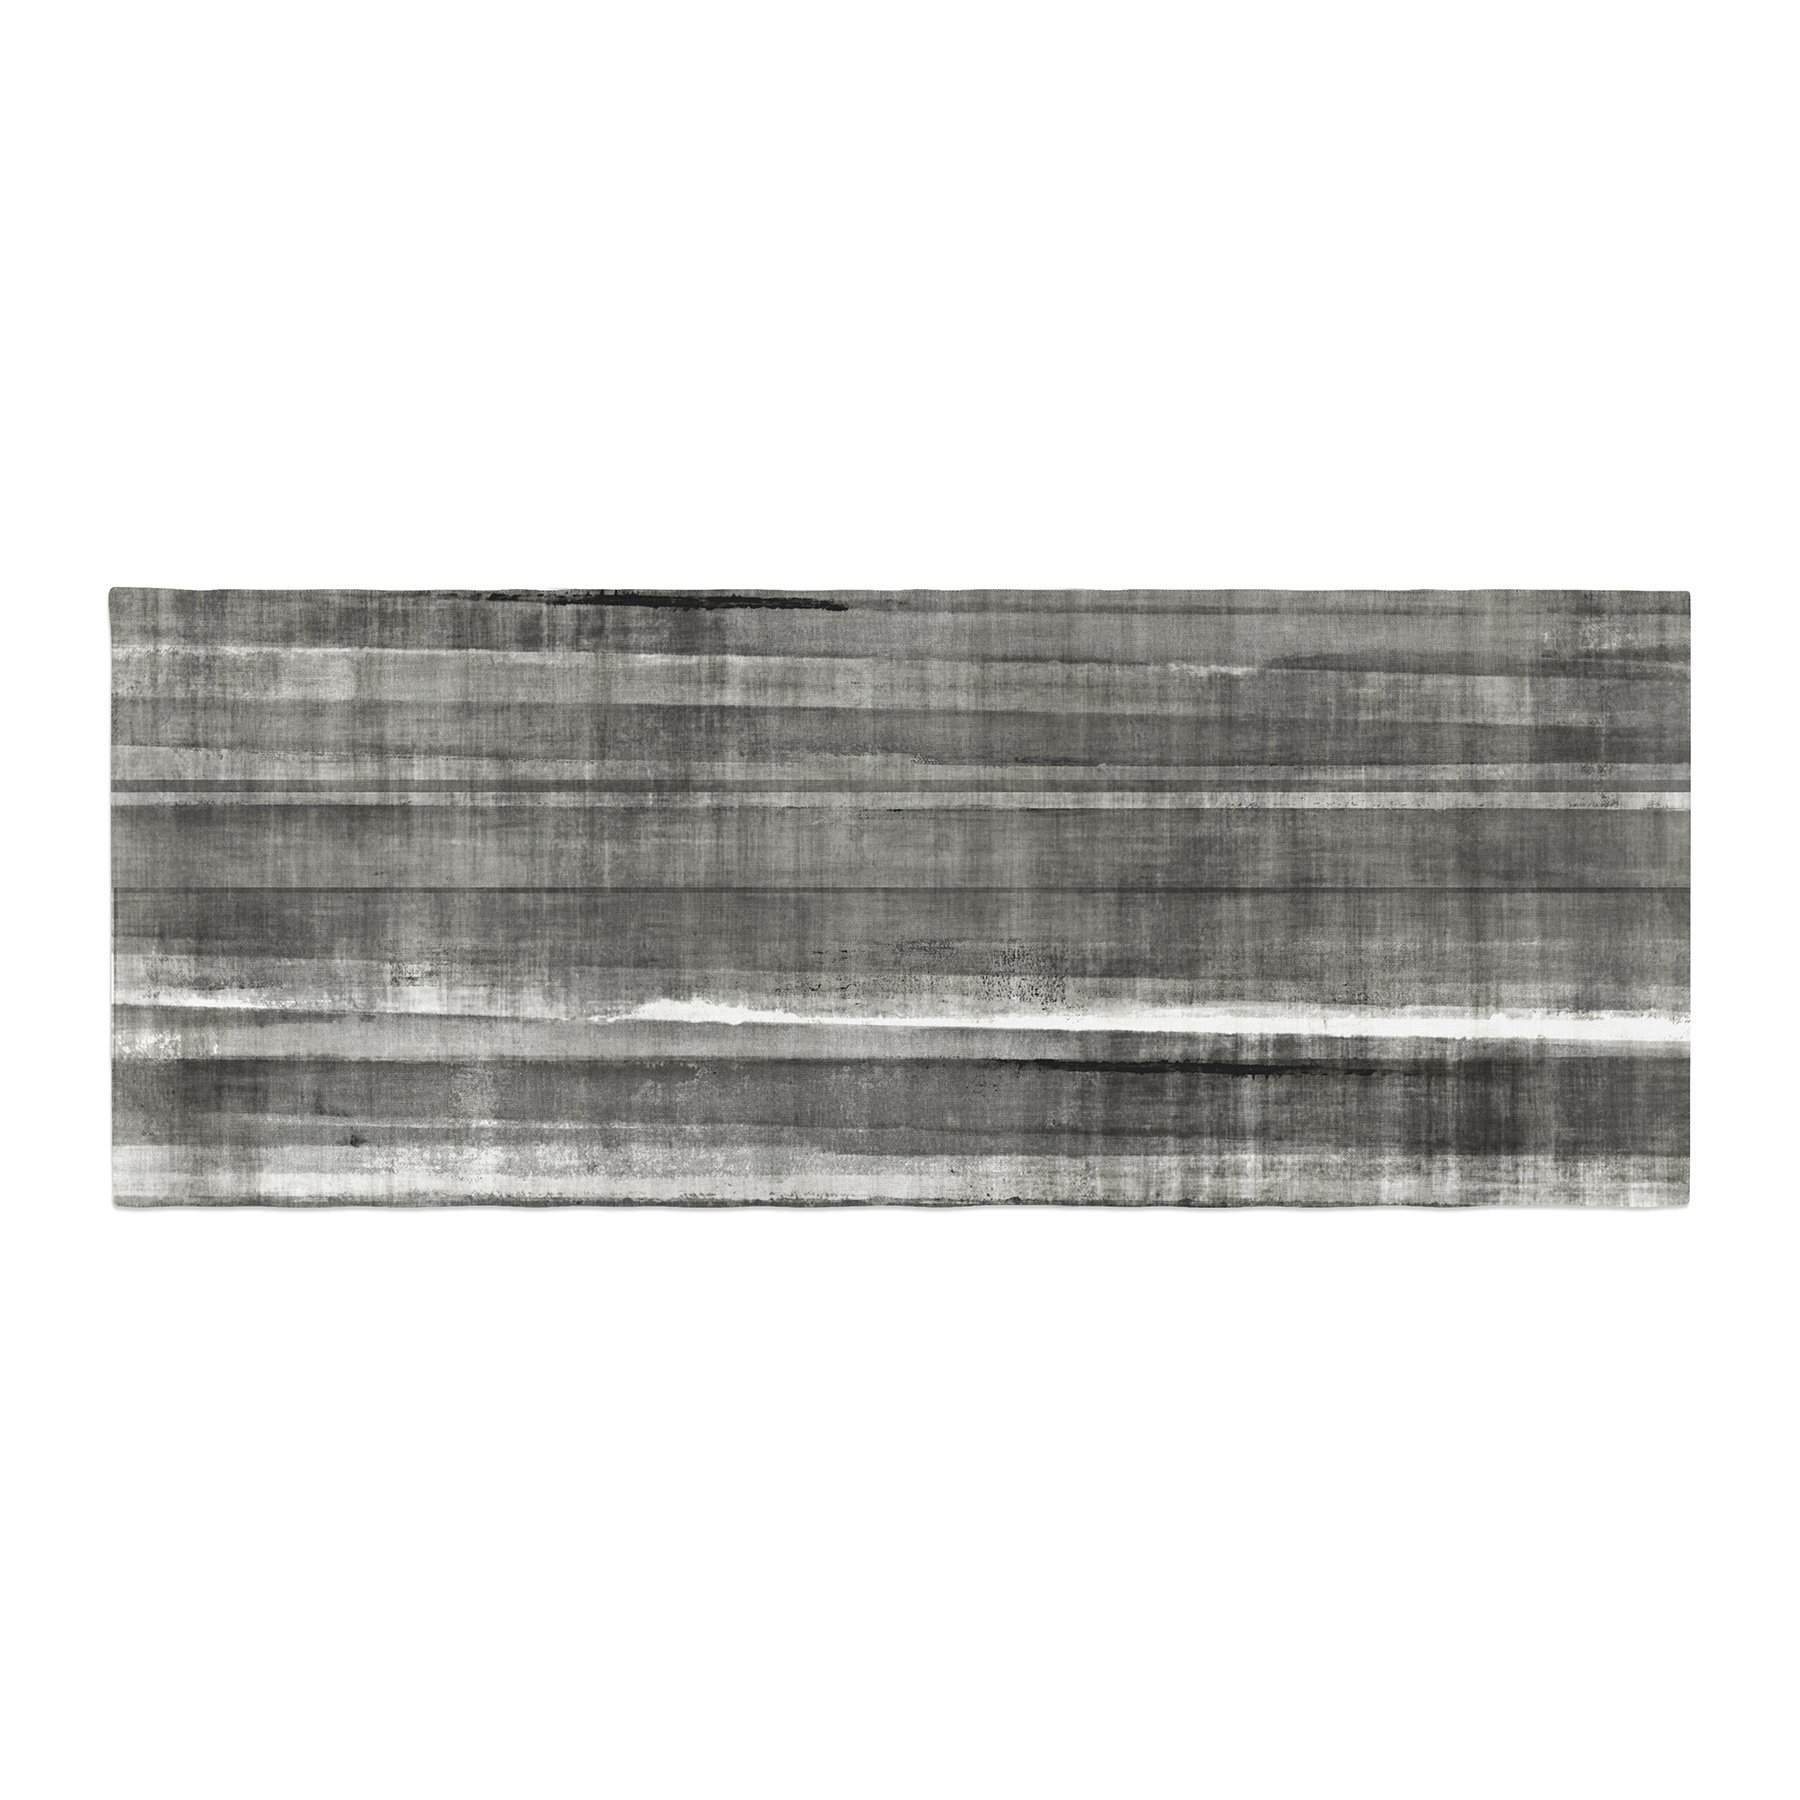 Kess InHouse CarolLynn Tice Grey Accent Dark Neutral Bed Runner, 34'' x 86''